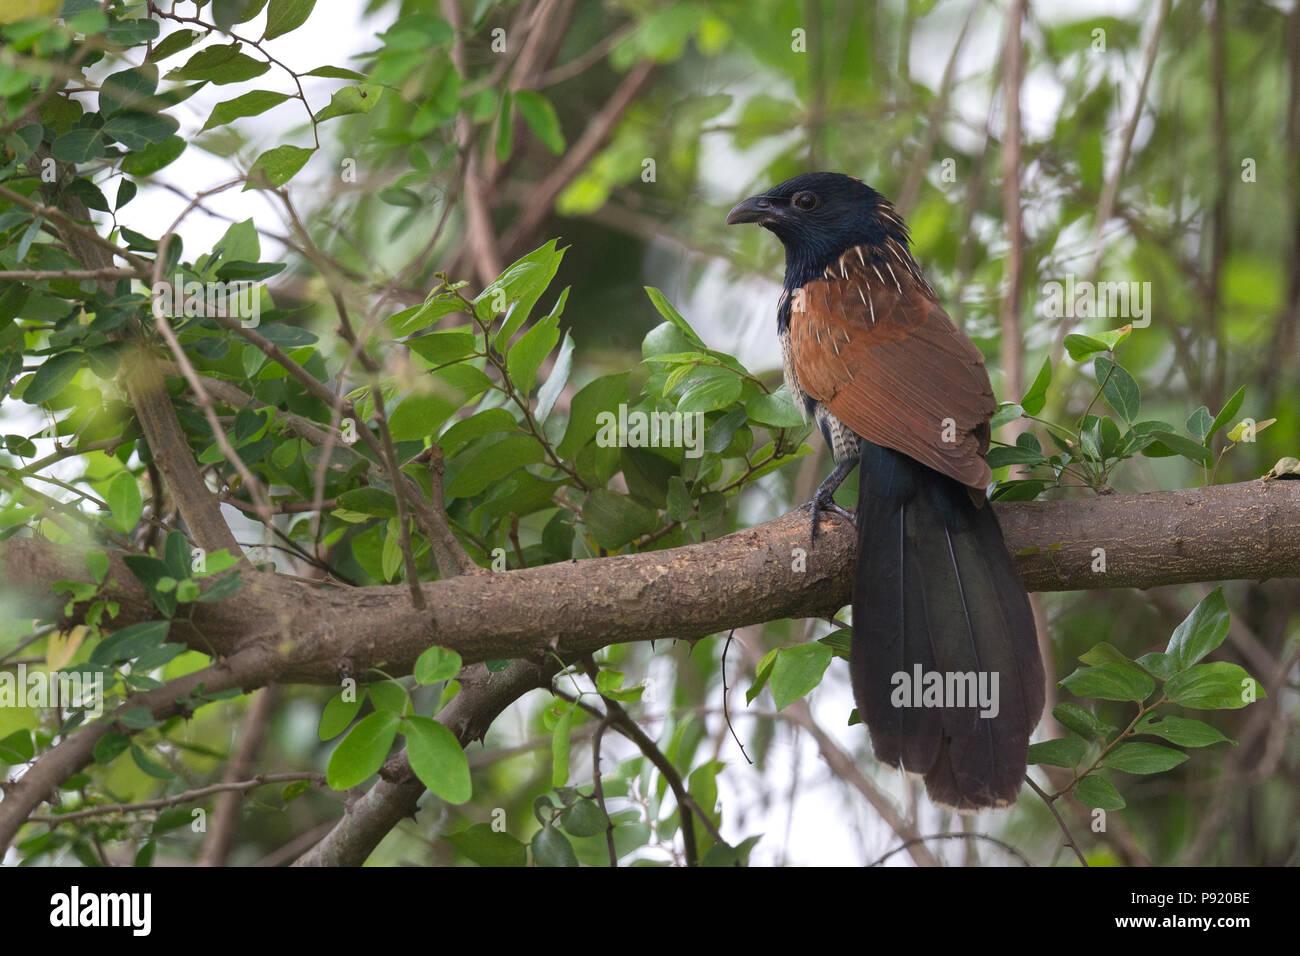 Lesser Coucal (Centropus bengalensis) in Jaguli, Nadia, West Bengal - Stock Image